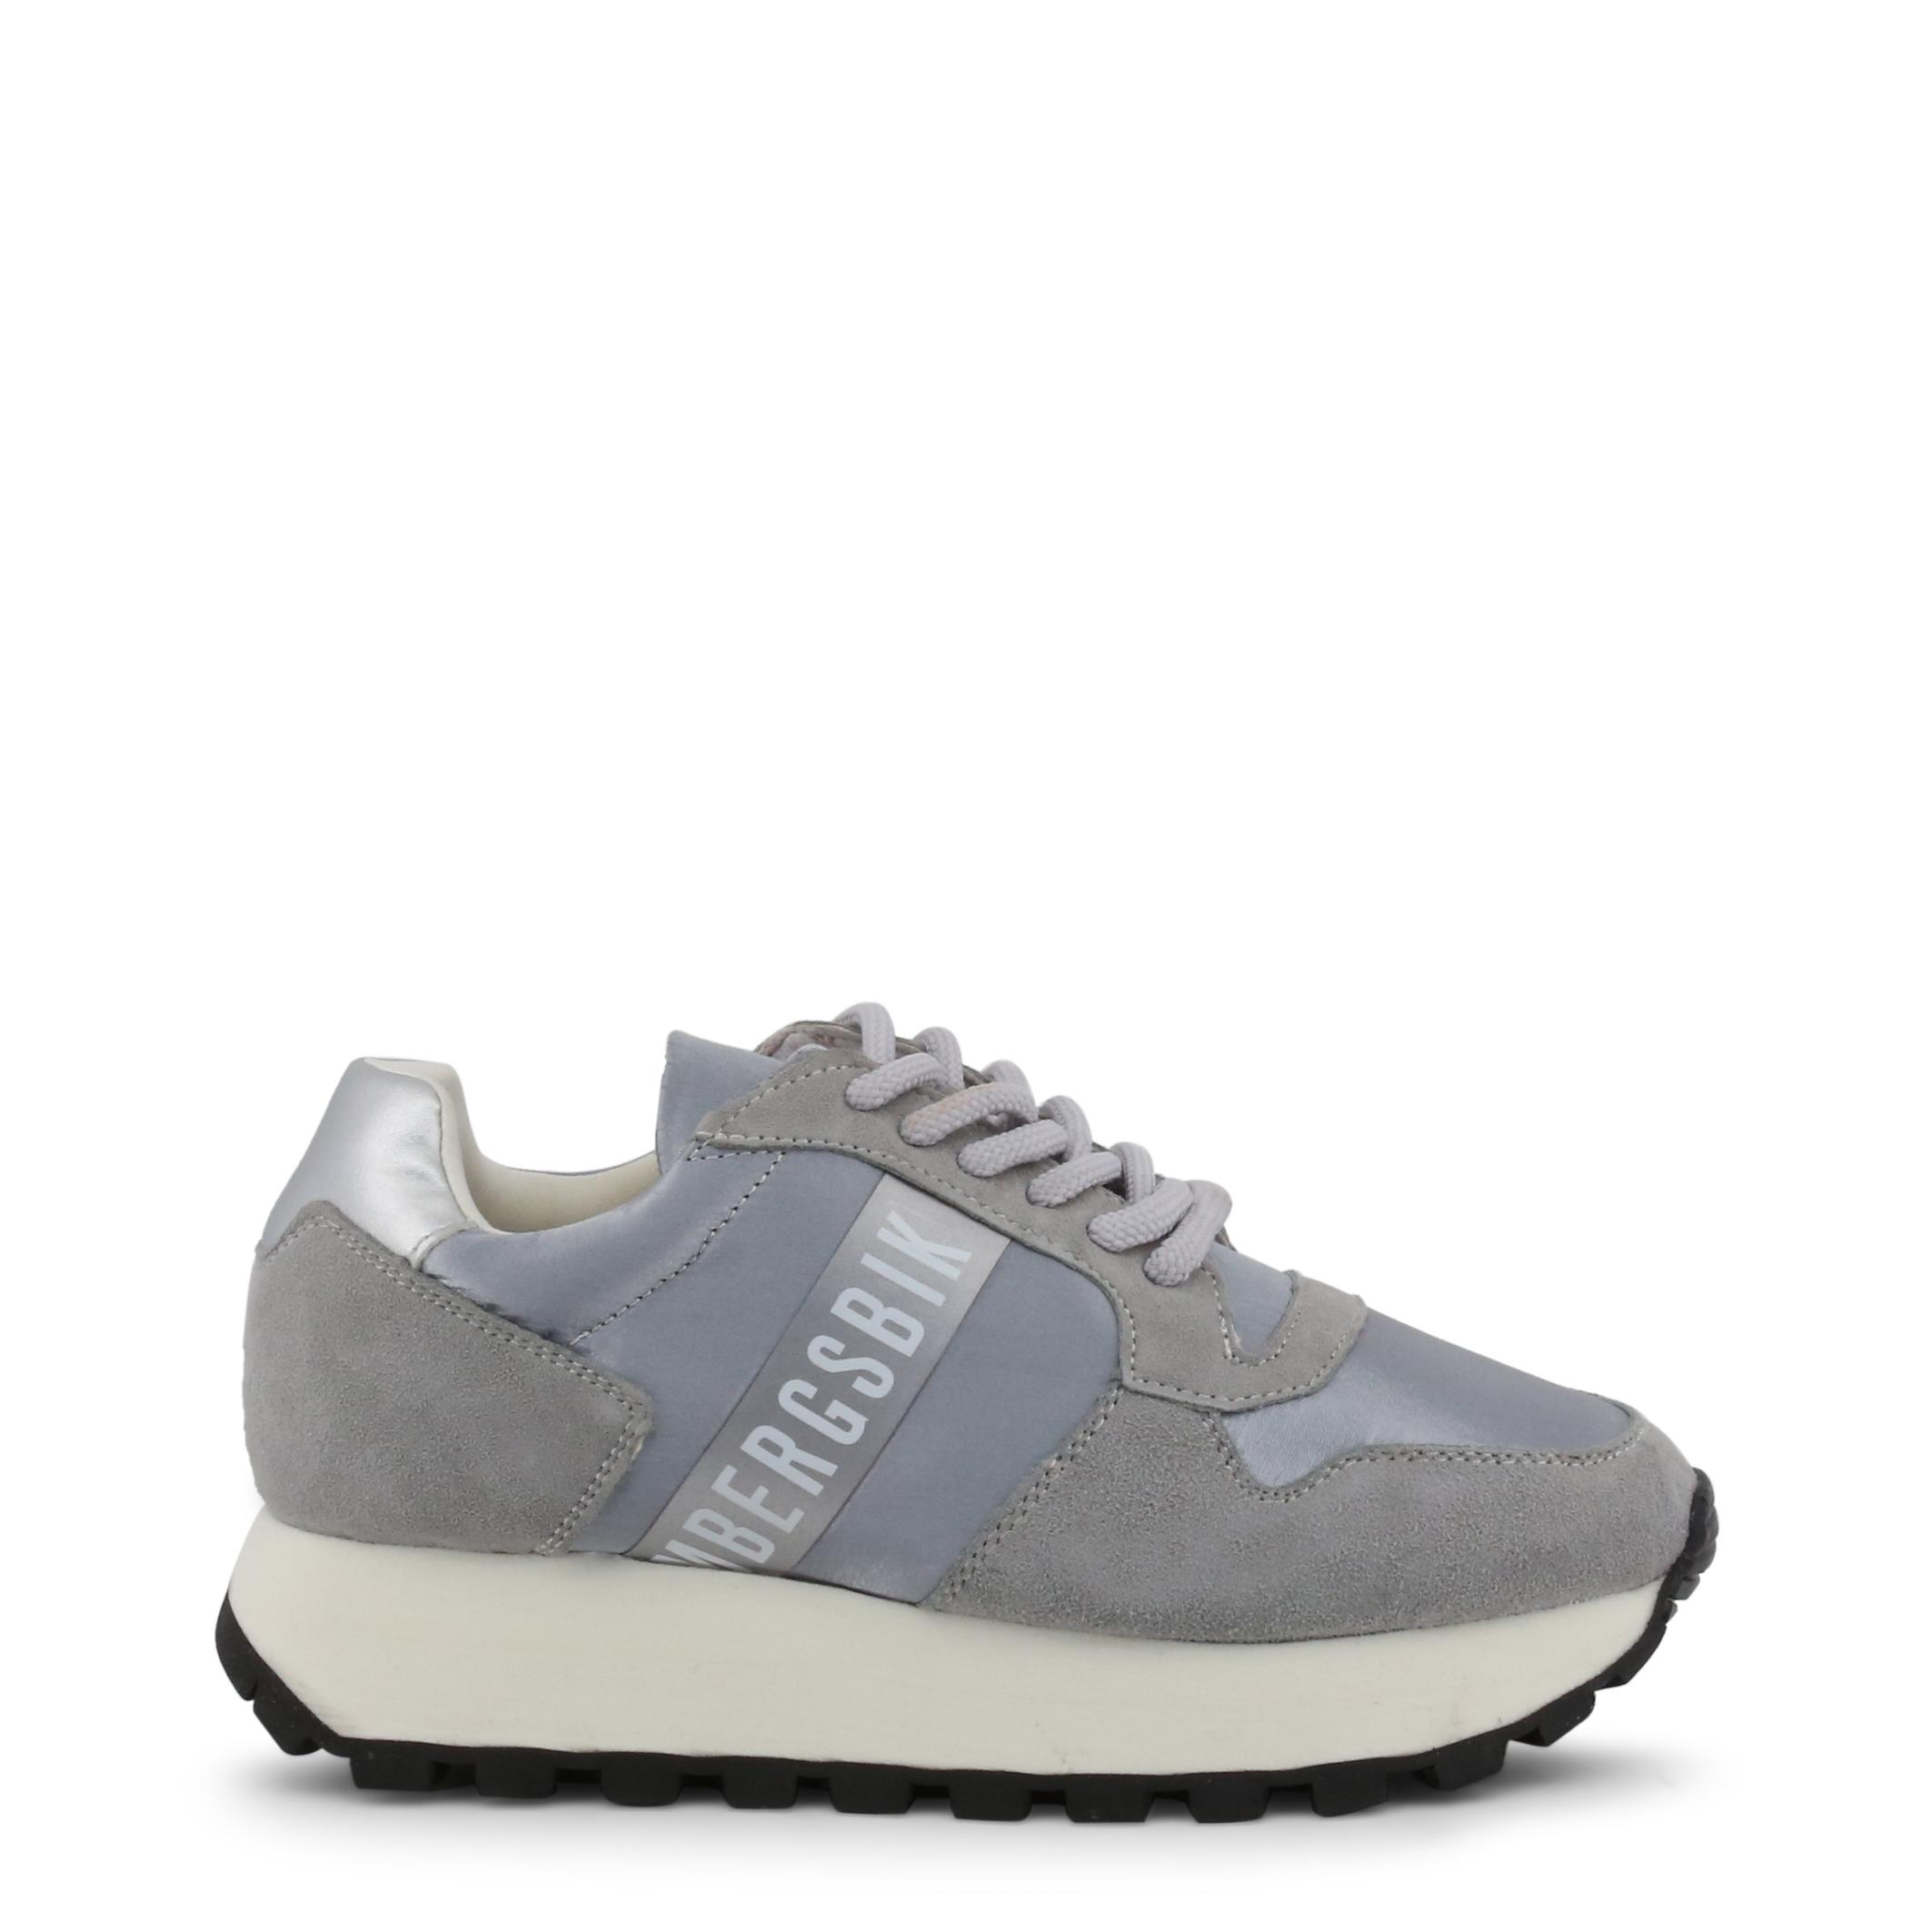 Baskets / Sneakers  Bikkembergs FEND-ER_2087 grey